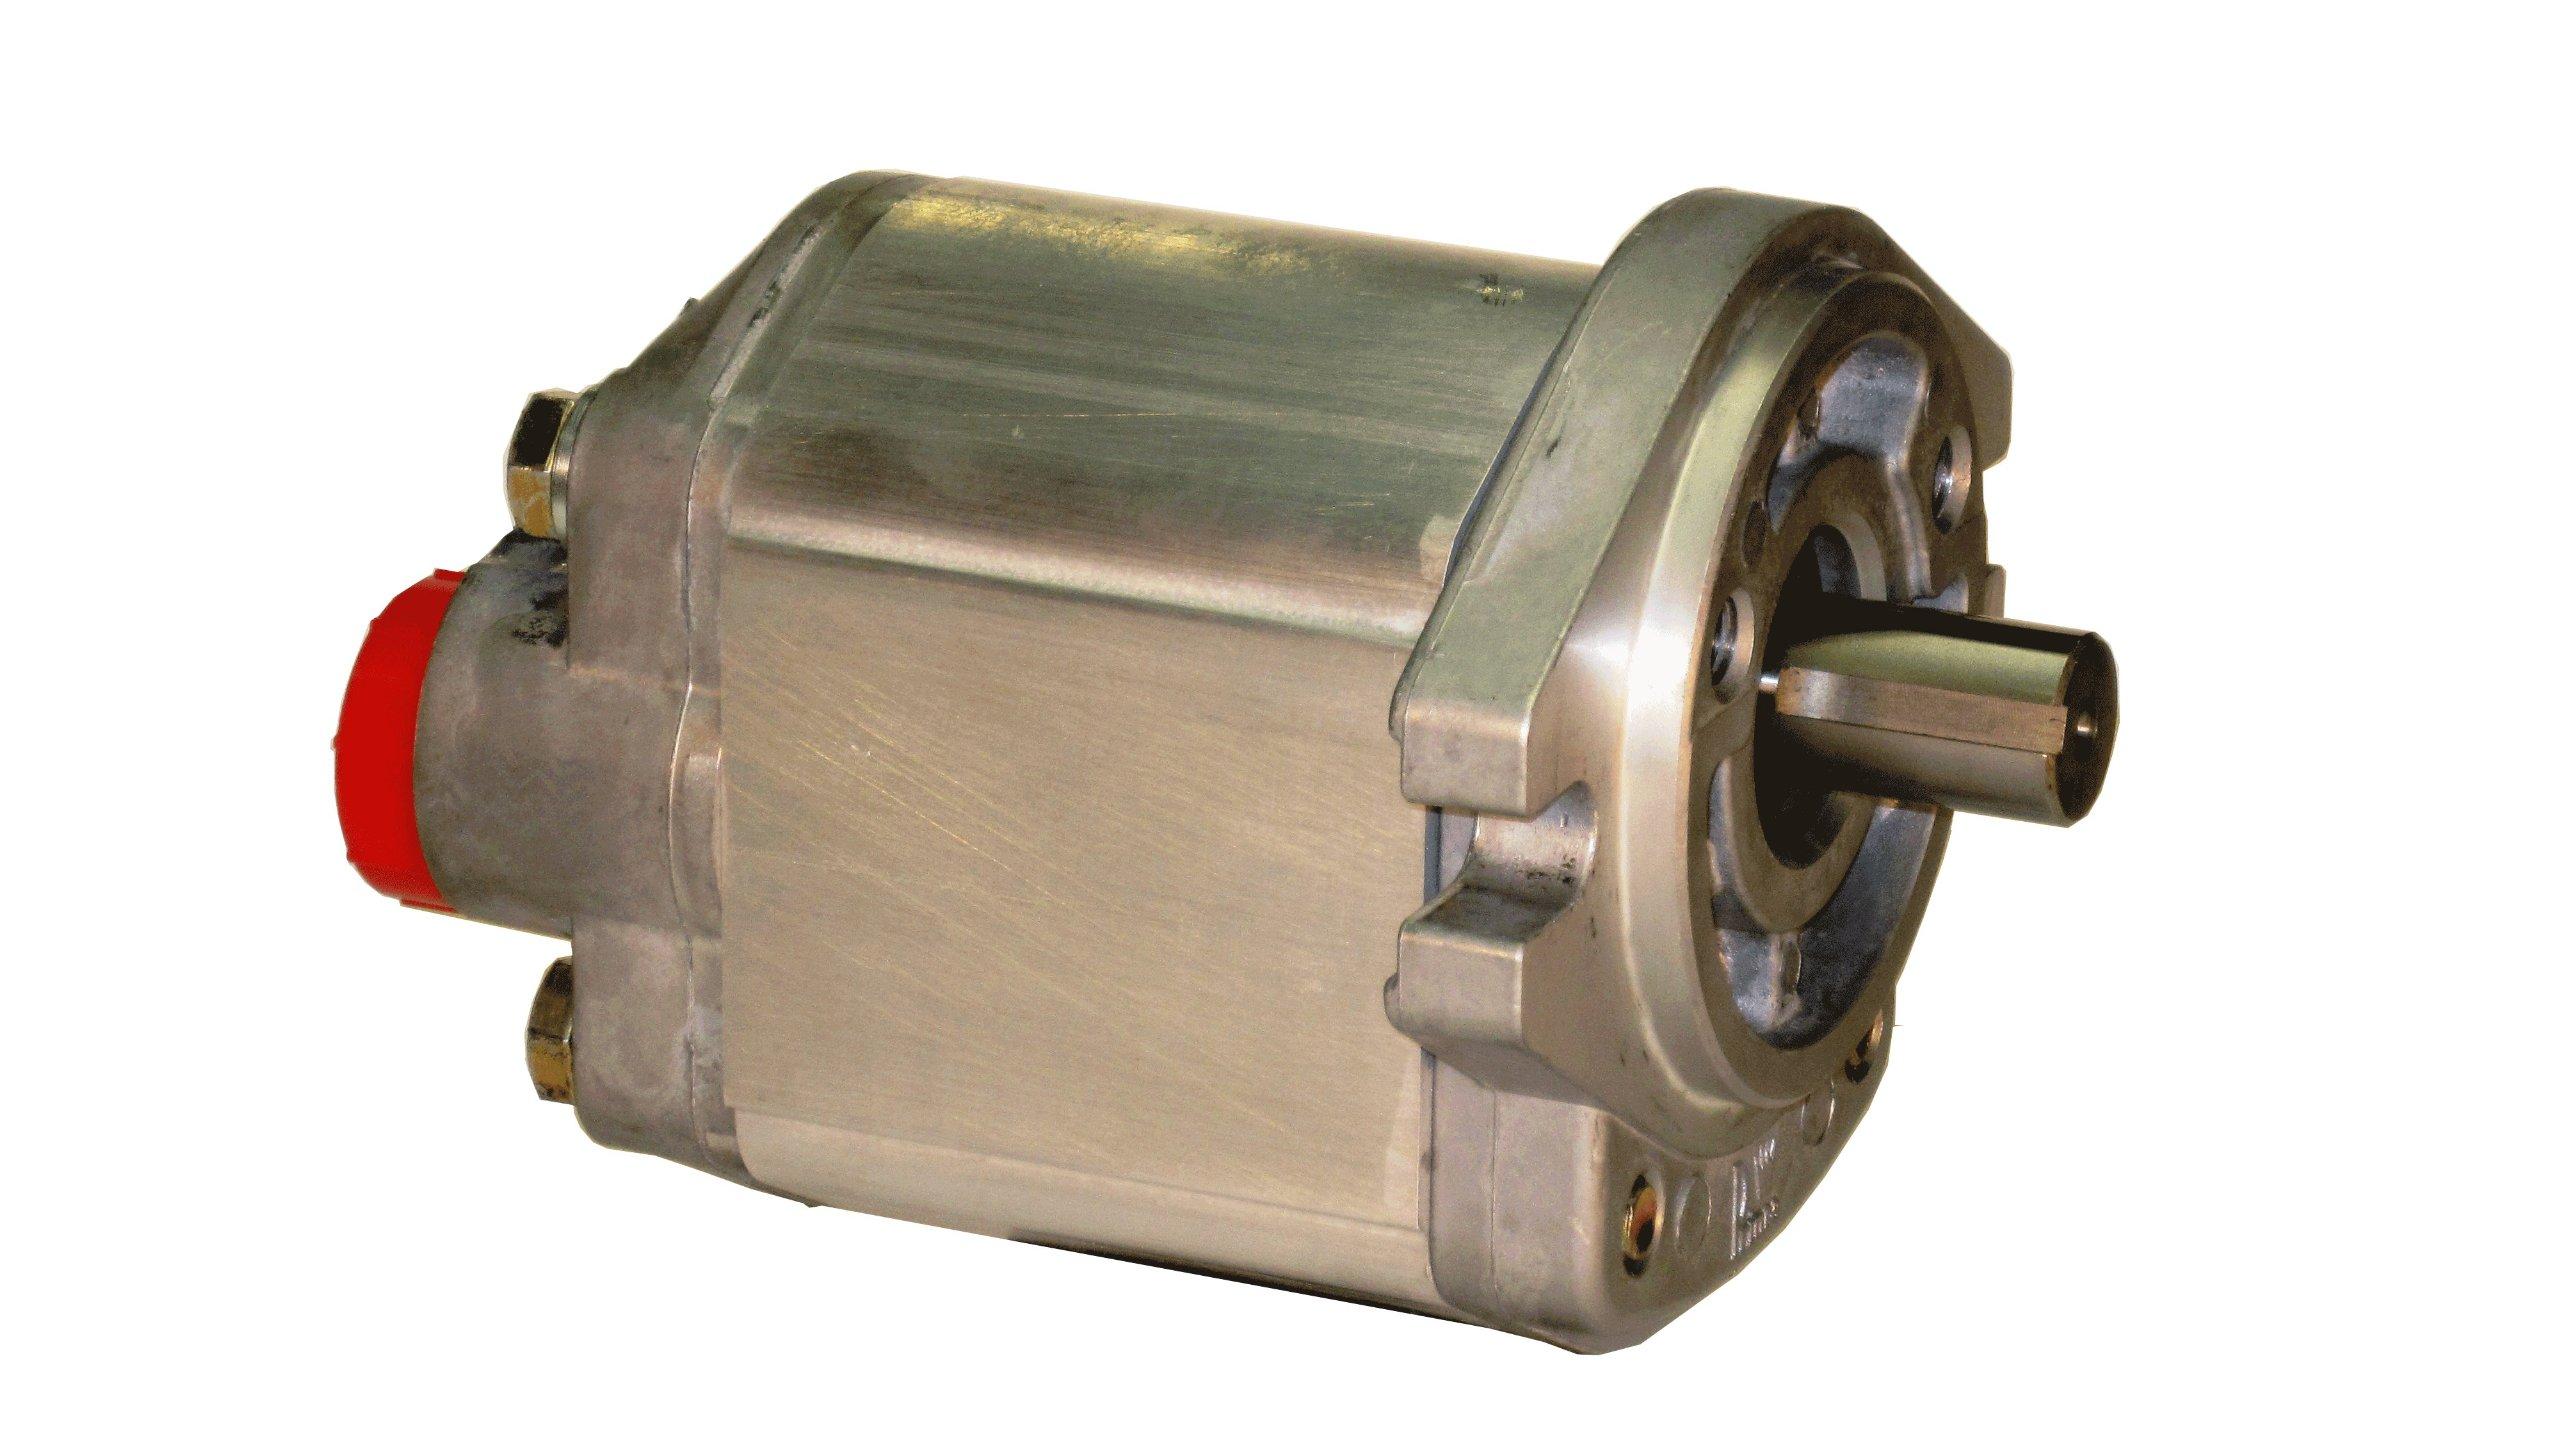 Prince Manufacturing SP20B14D9H4-L Hydraulic Gear Pump, 25.49 HP Motor, 3000 PSI Maximum Pressure, 14.39 GPM Maximum Flow Rate, Counter Clockwise Rotation, Self-Lubricating, SAE A Flange, Aluminum